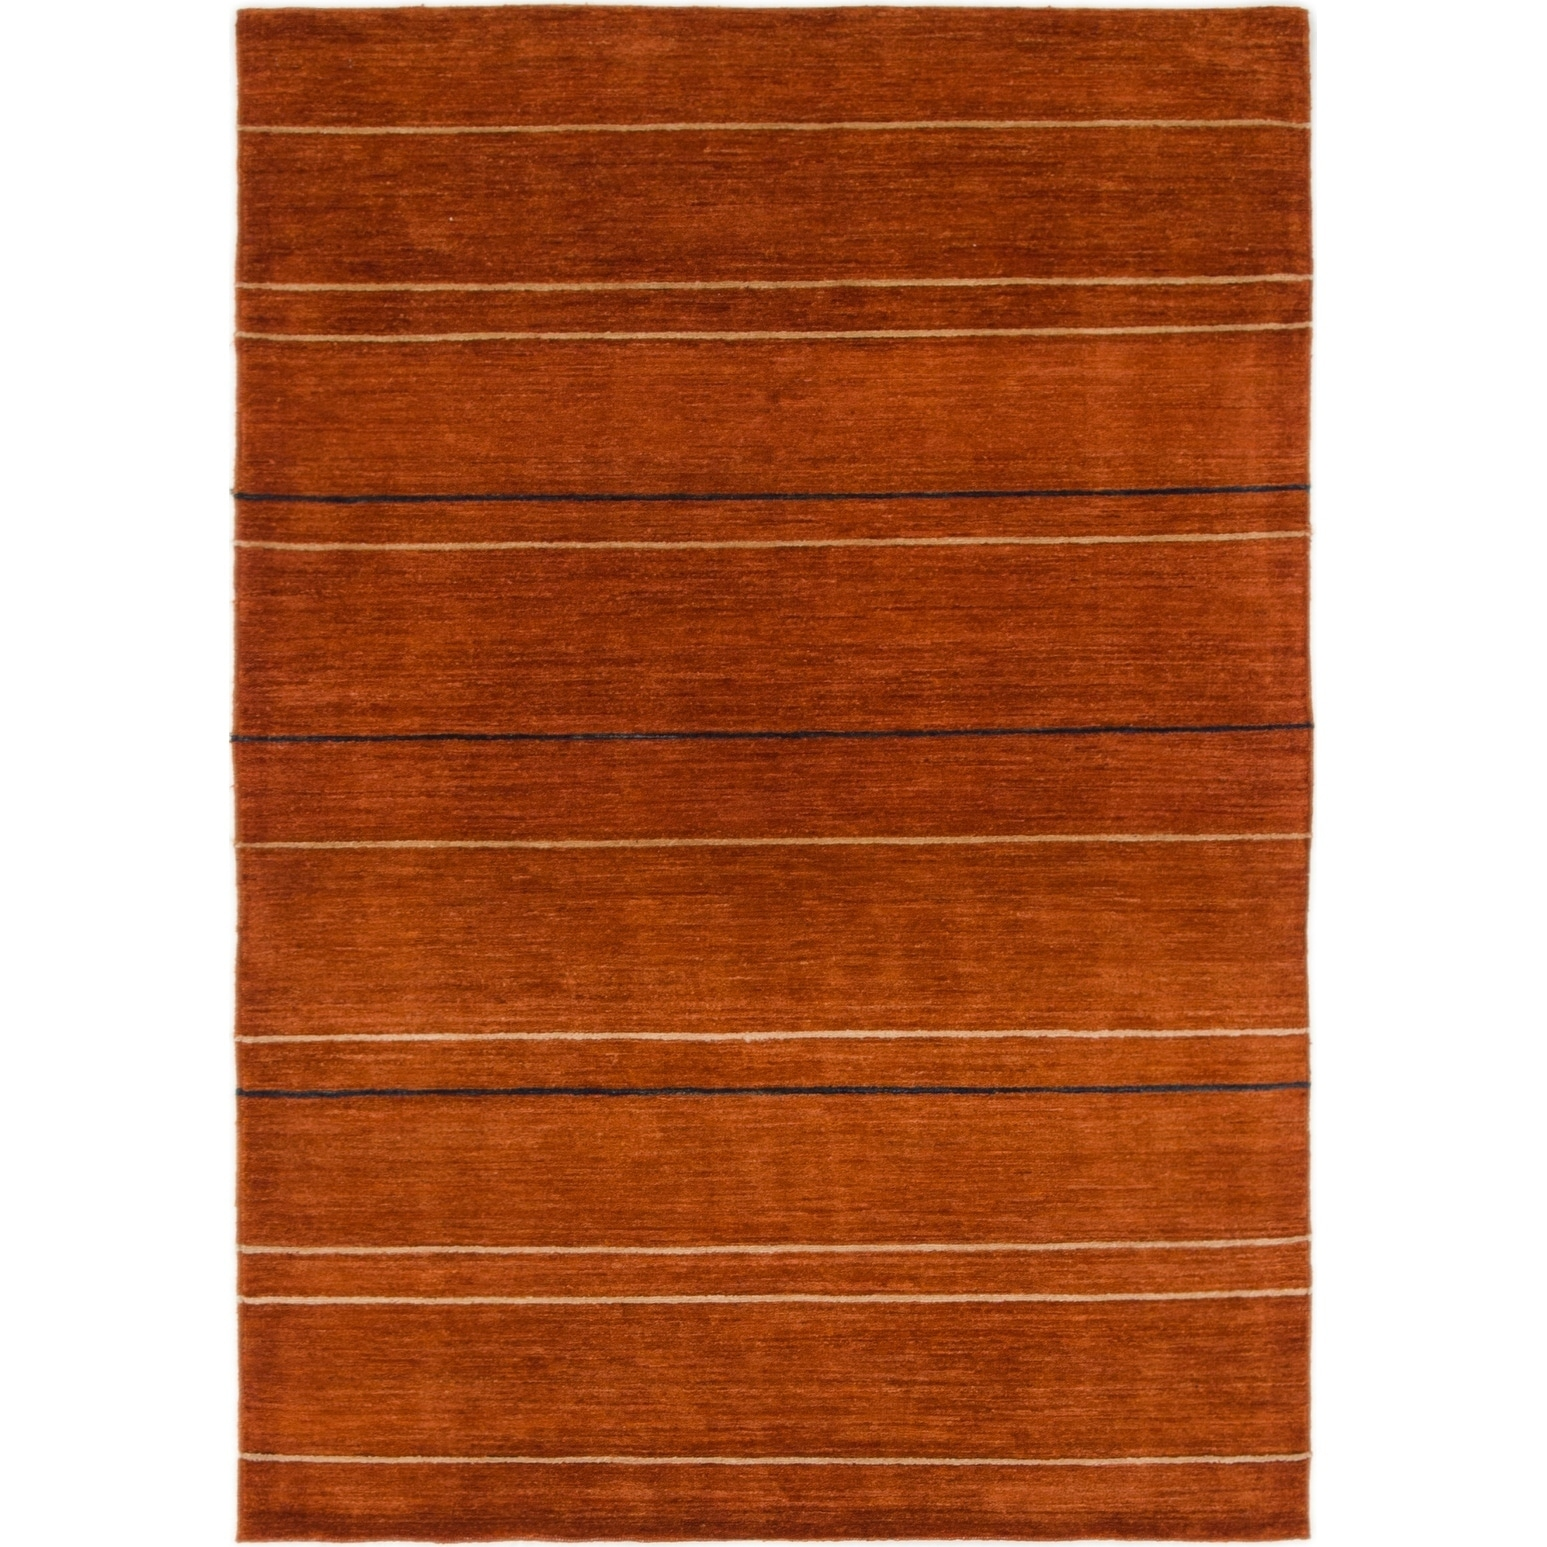 Hand Knotted Kashkuli Gabbeh Wool Area Rug - 3 10 x 5 8 (Terracotta - 3 10 x 5 8)